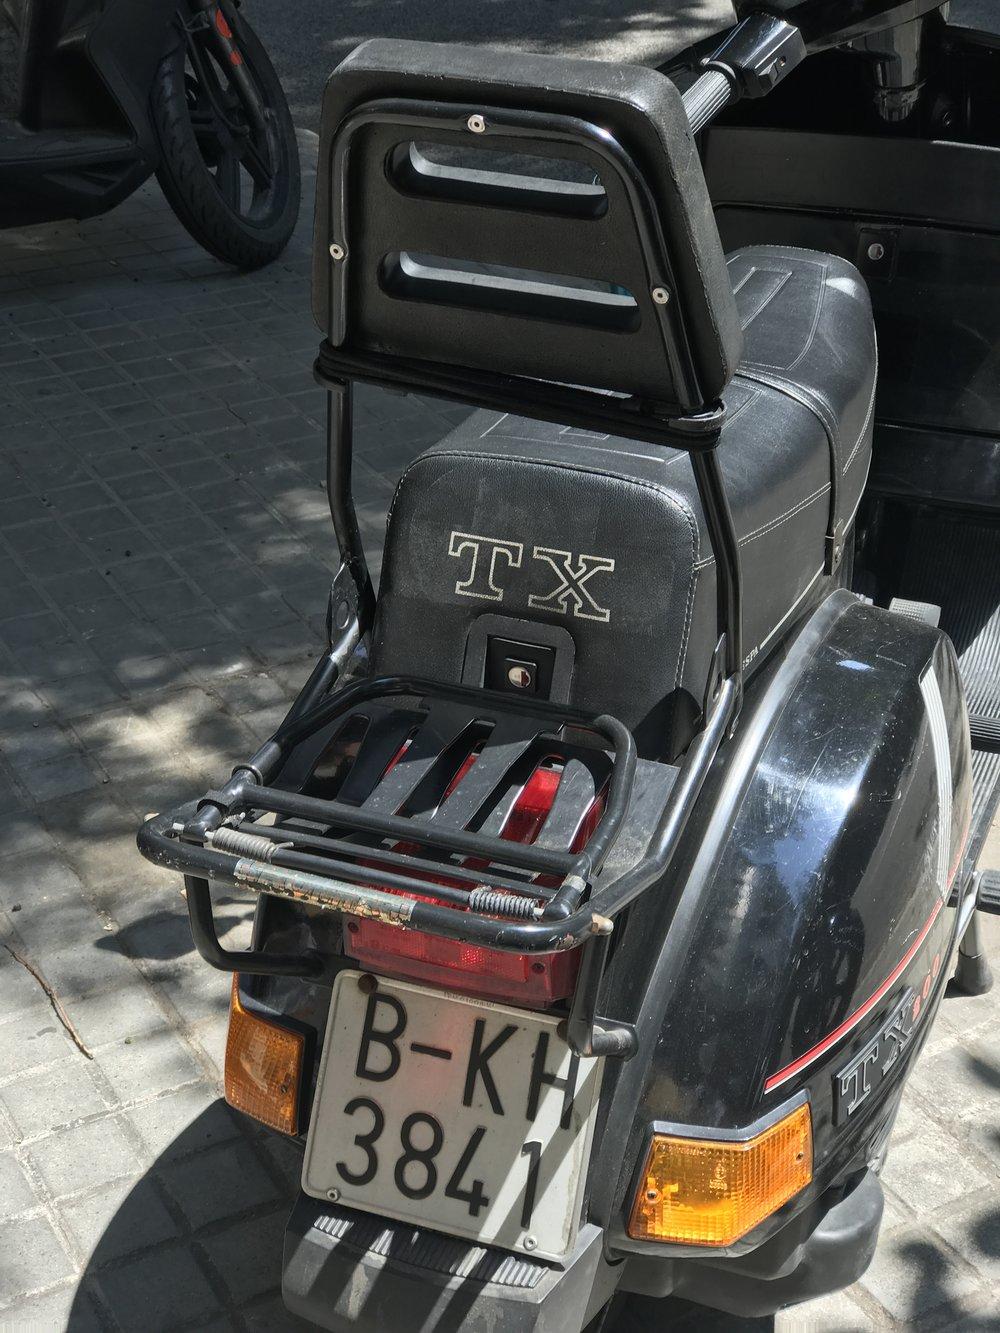 Motovespa TX200